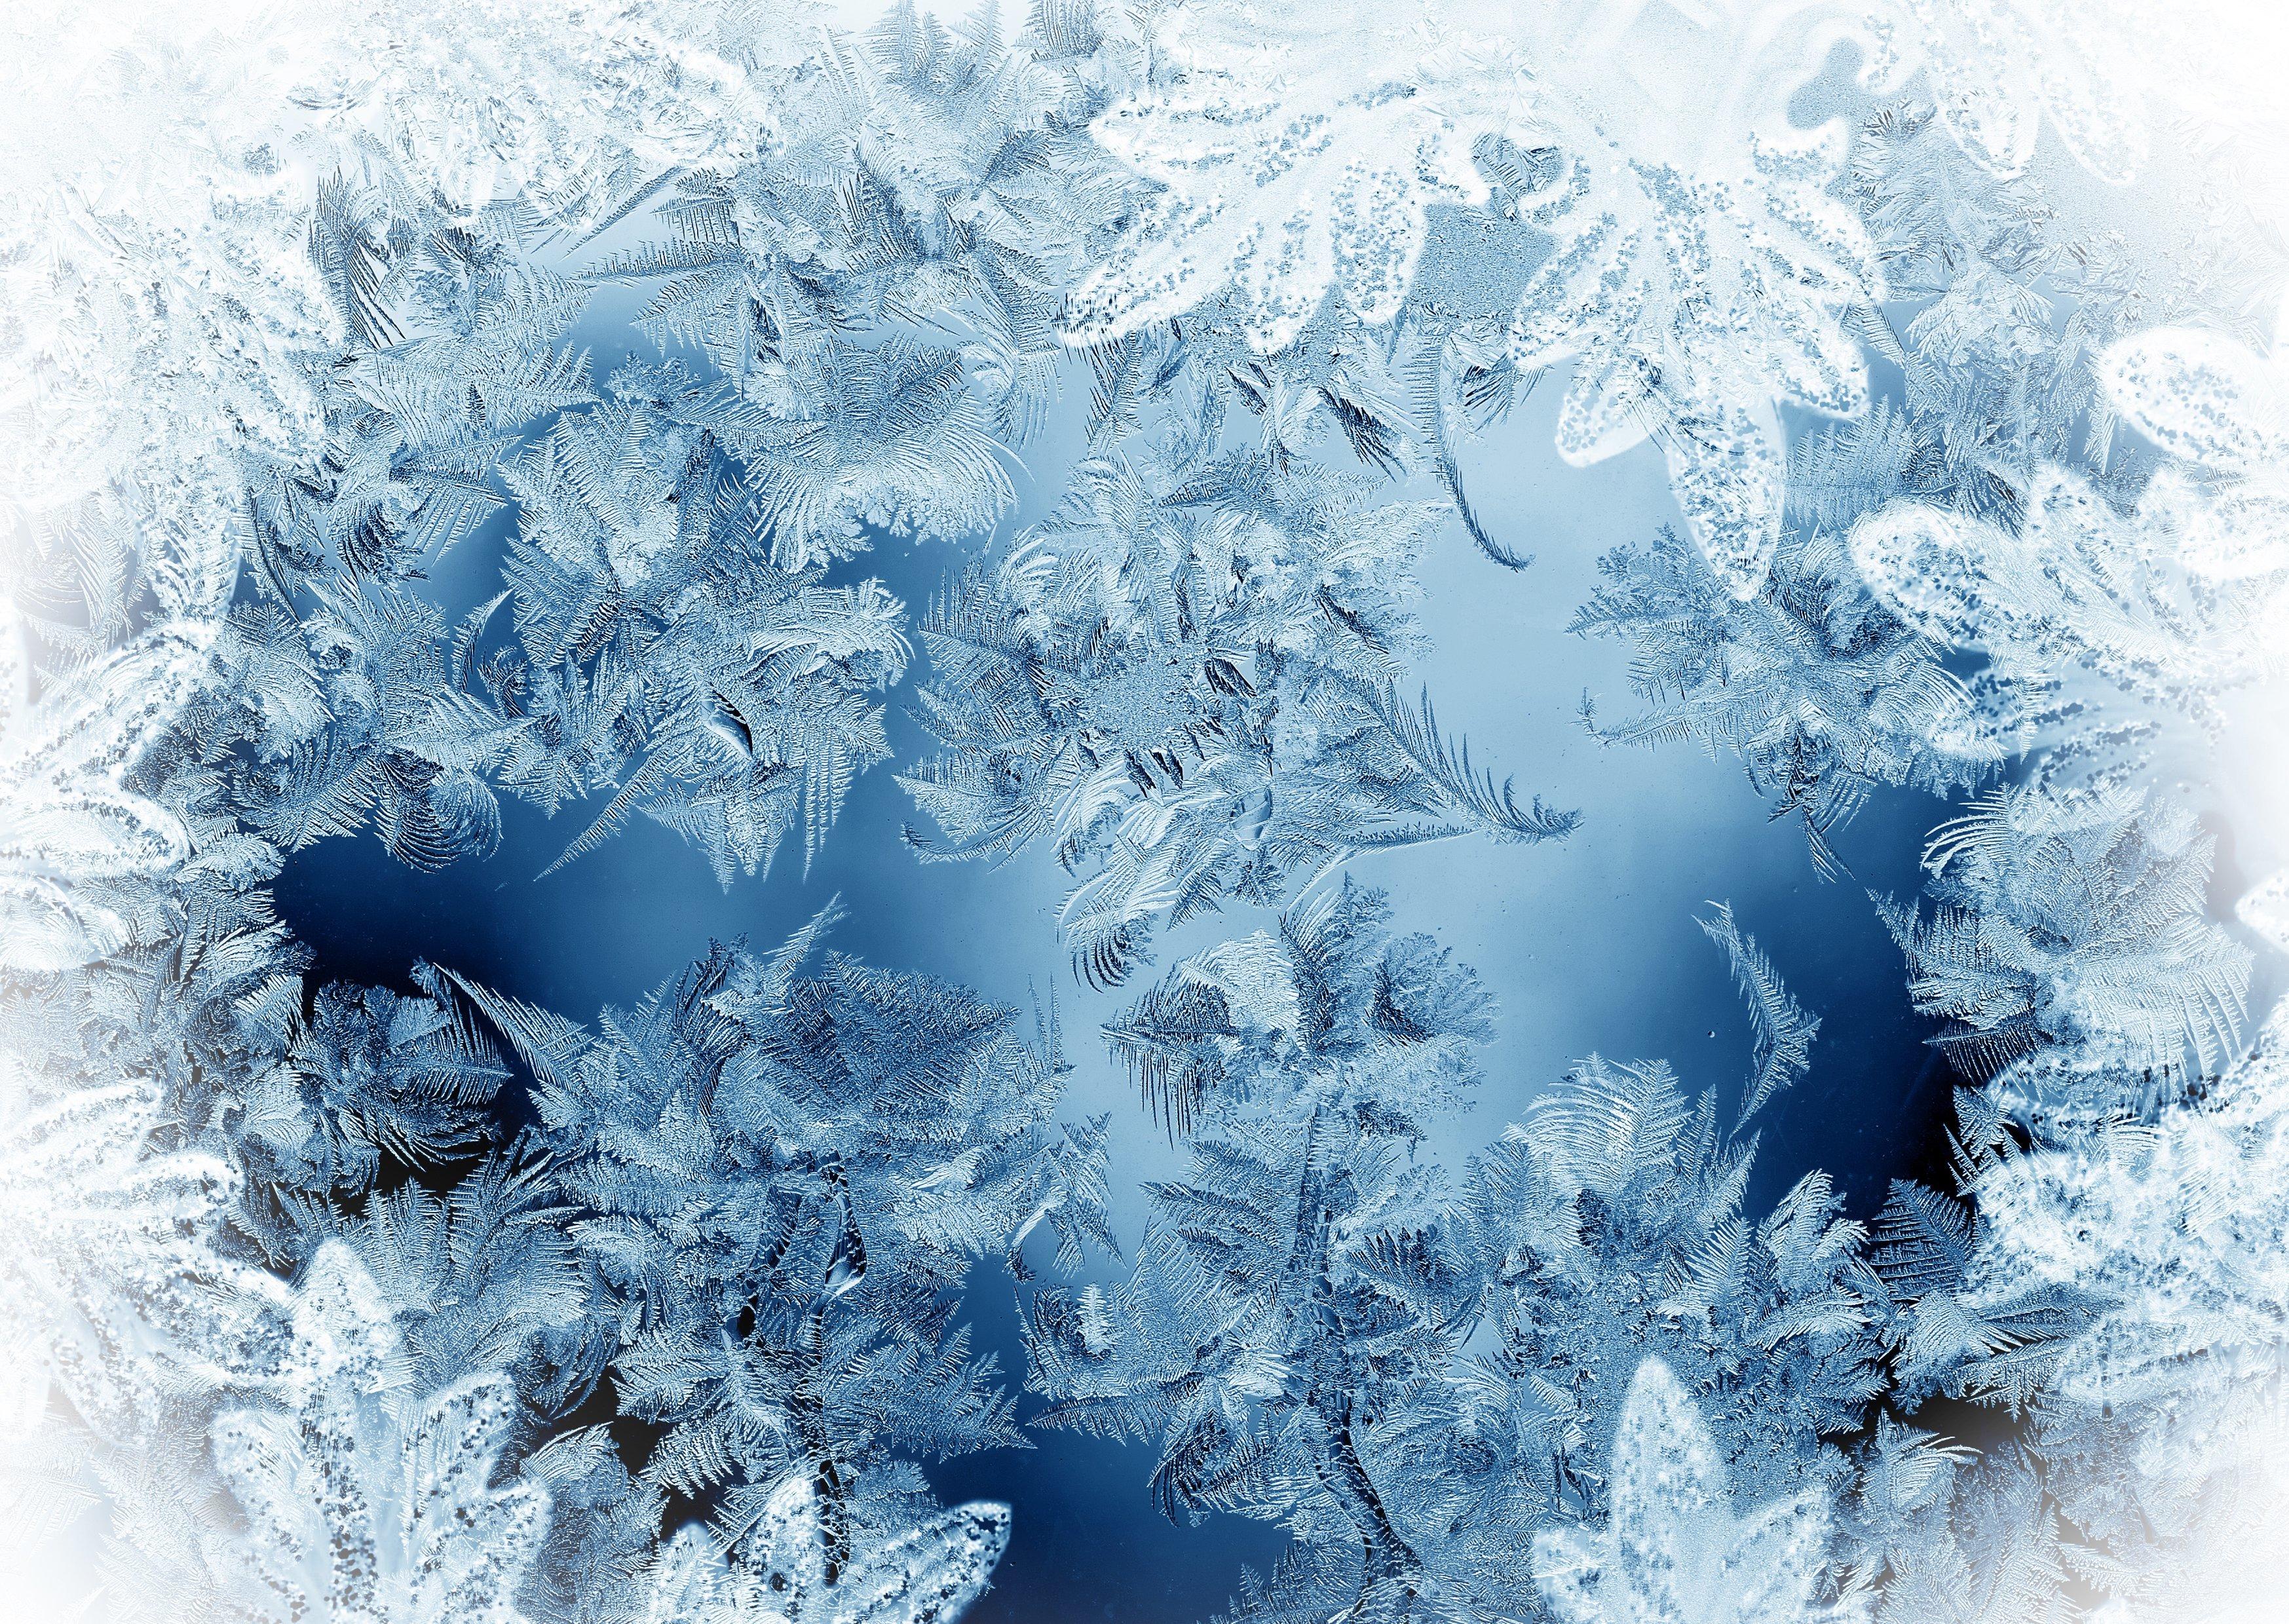 Texture ice pattern frost wallpaper 3494x2479 228582 WallpaperUP 3494x2479